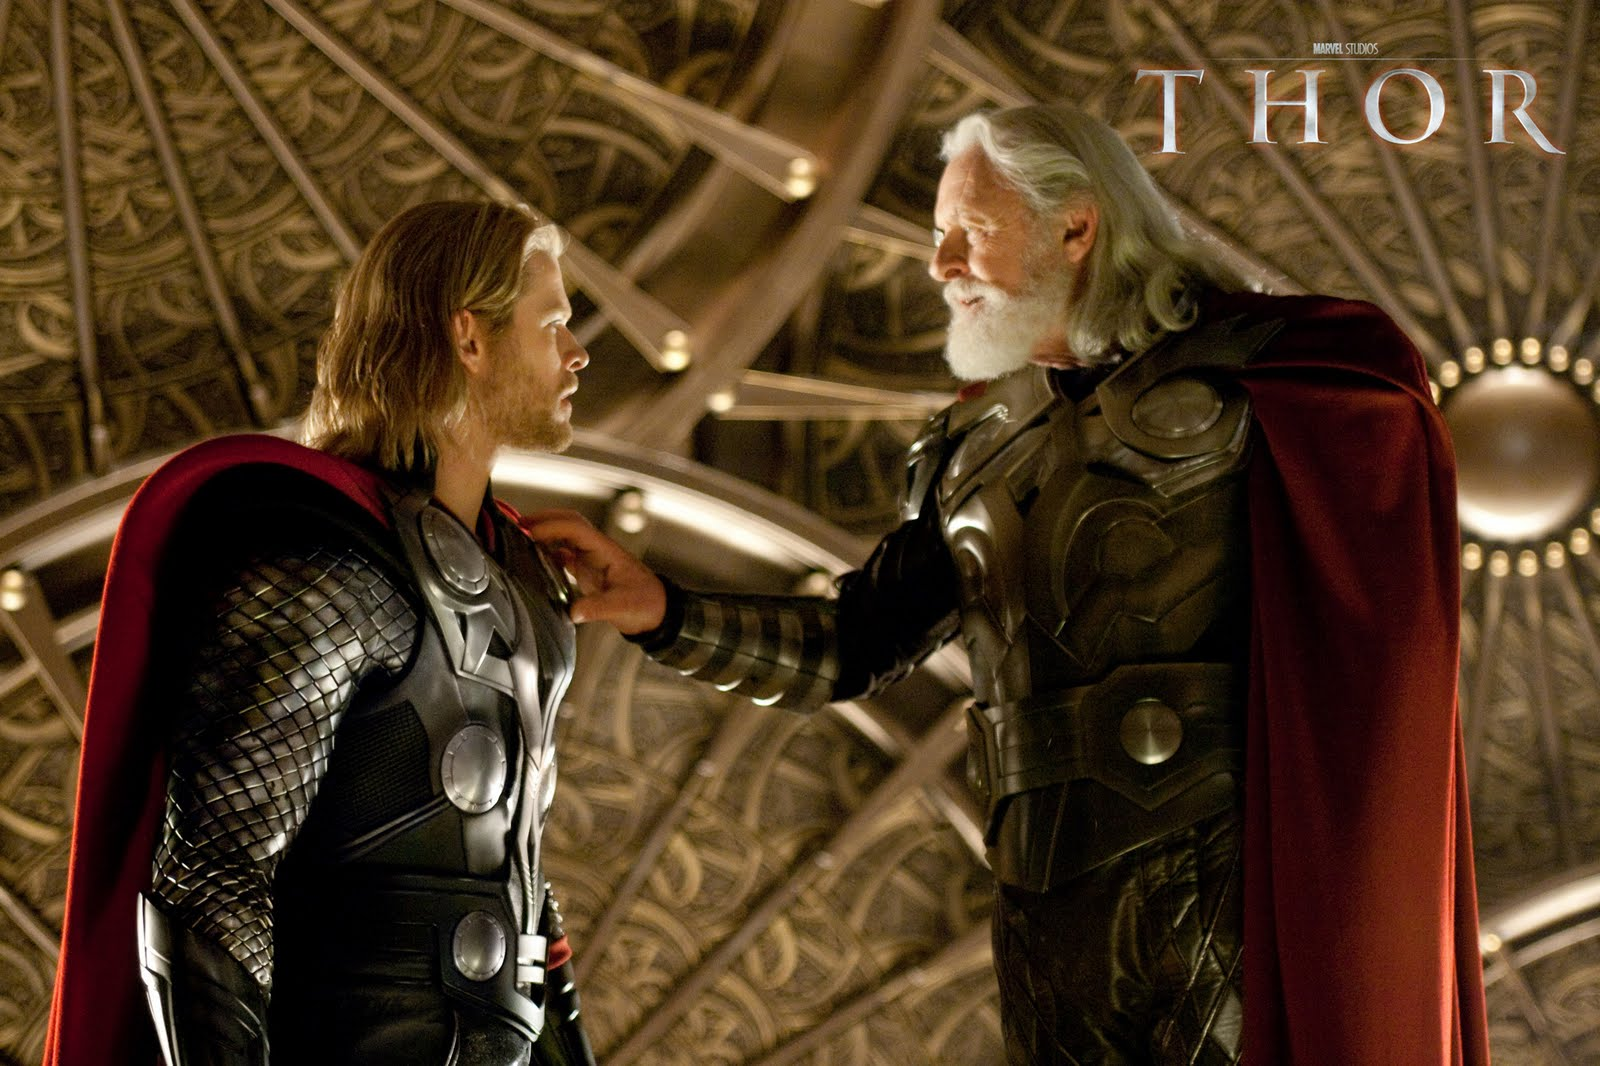 http://1.bp.blogspot.com/-UpUN7UJrBEA/TdnKmsafaxI/AAAAAAAAA1M/uNIi7DkGT3o/s1600/Thor-Movie-2011-Wallpapers-4.jpg